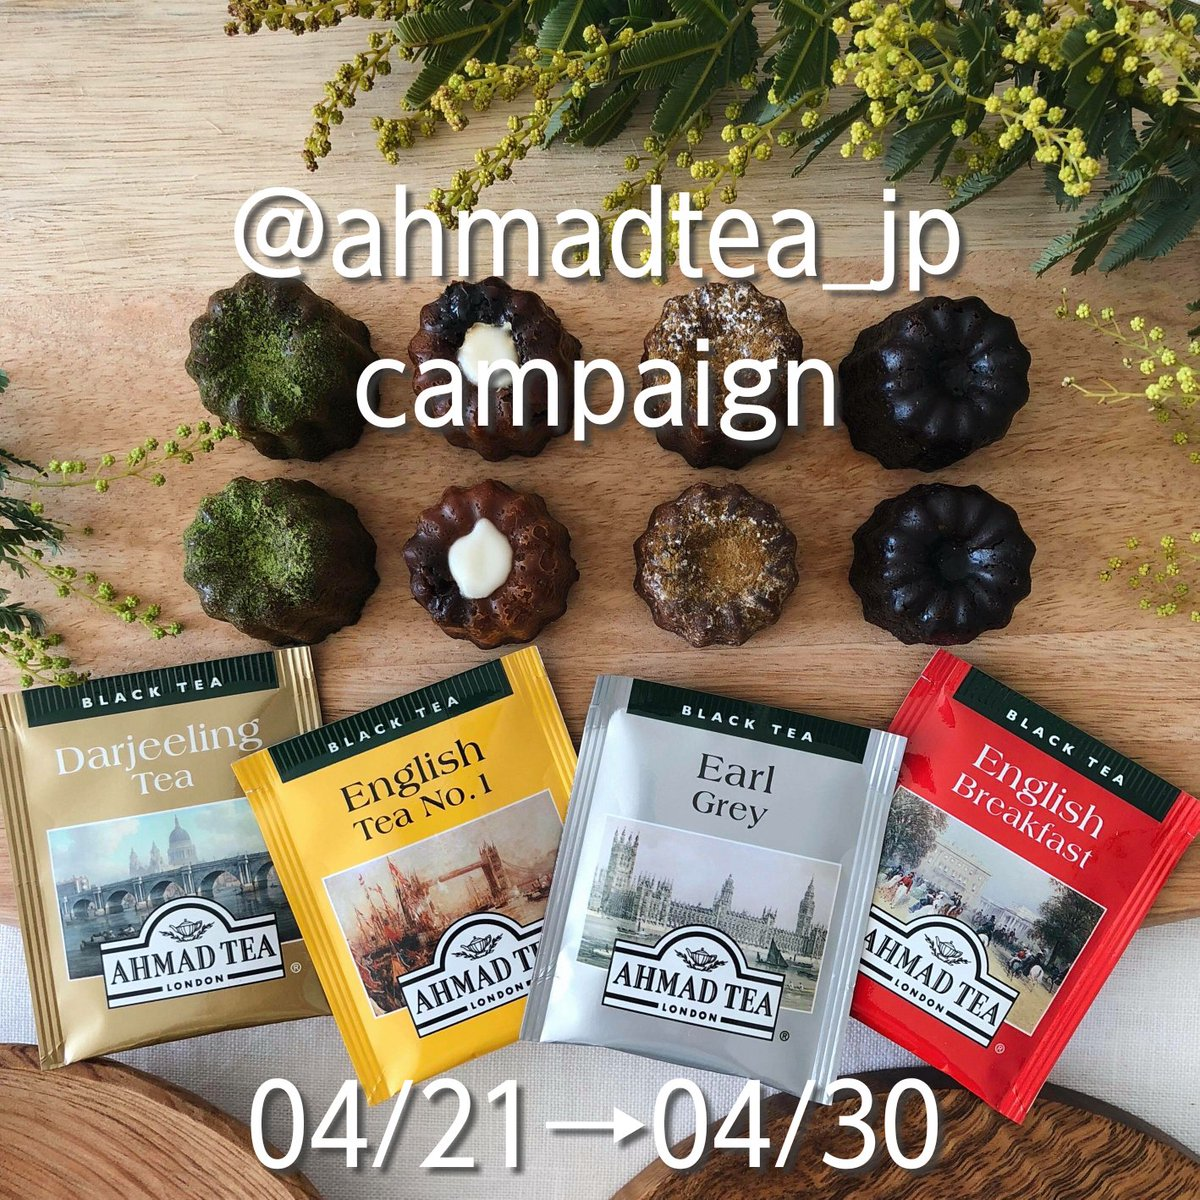 AHMAD TEA / アーマッドティーさんの投稿画像